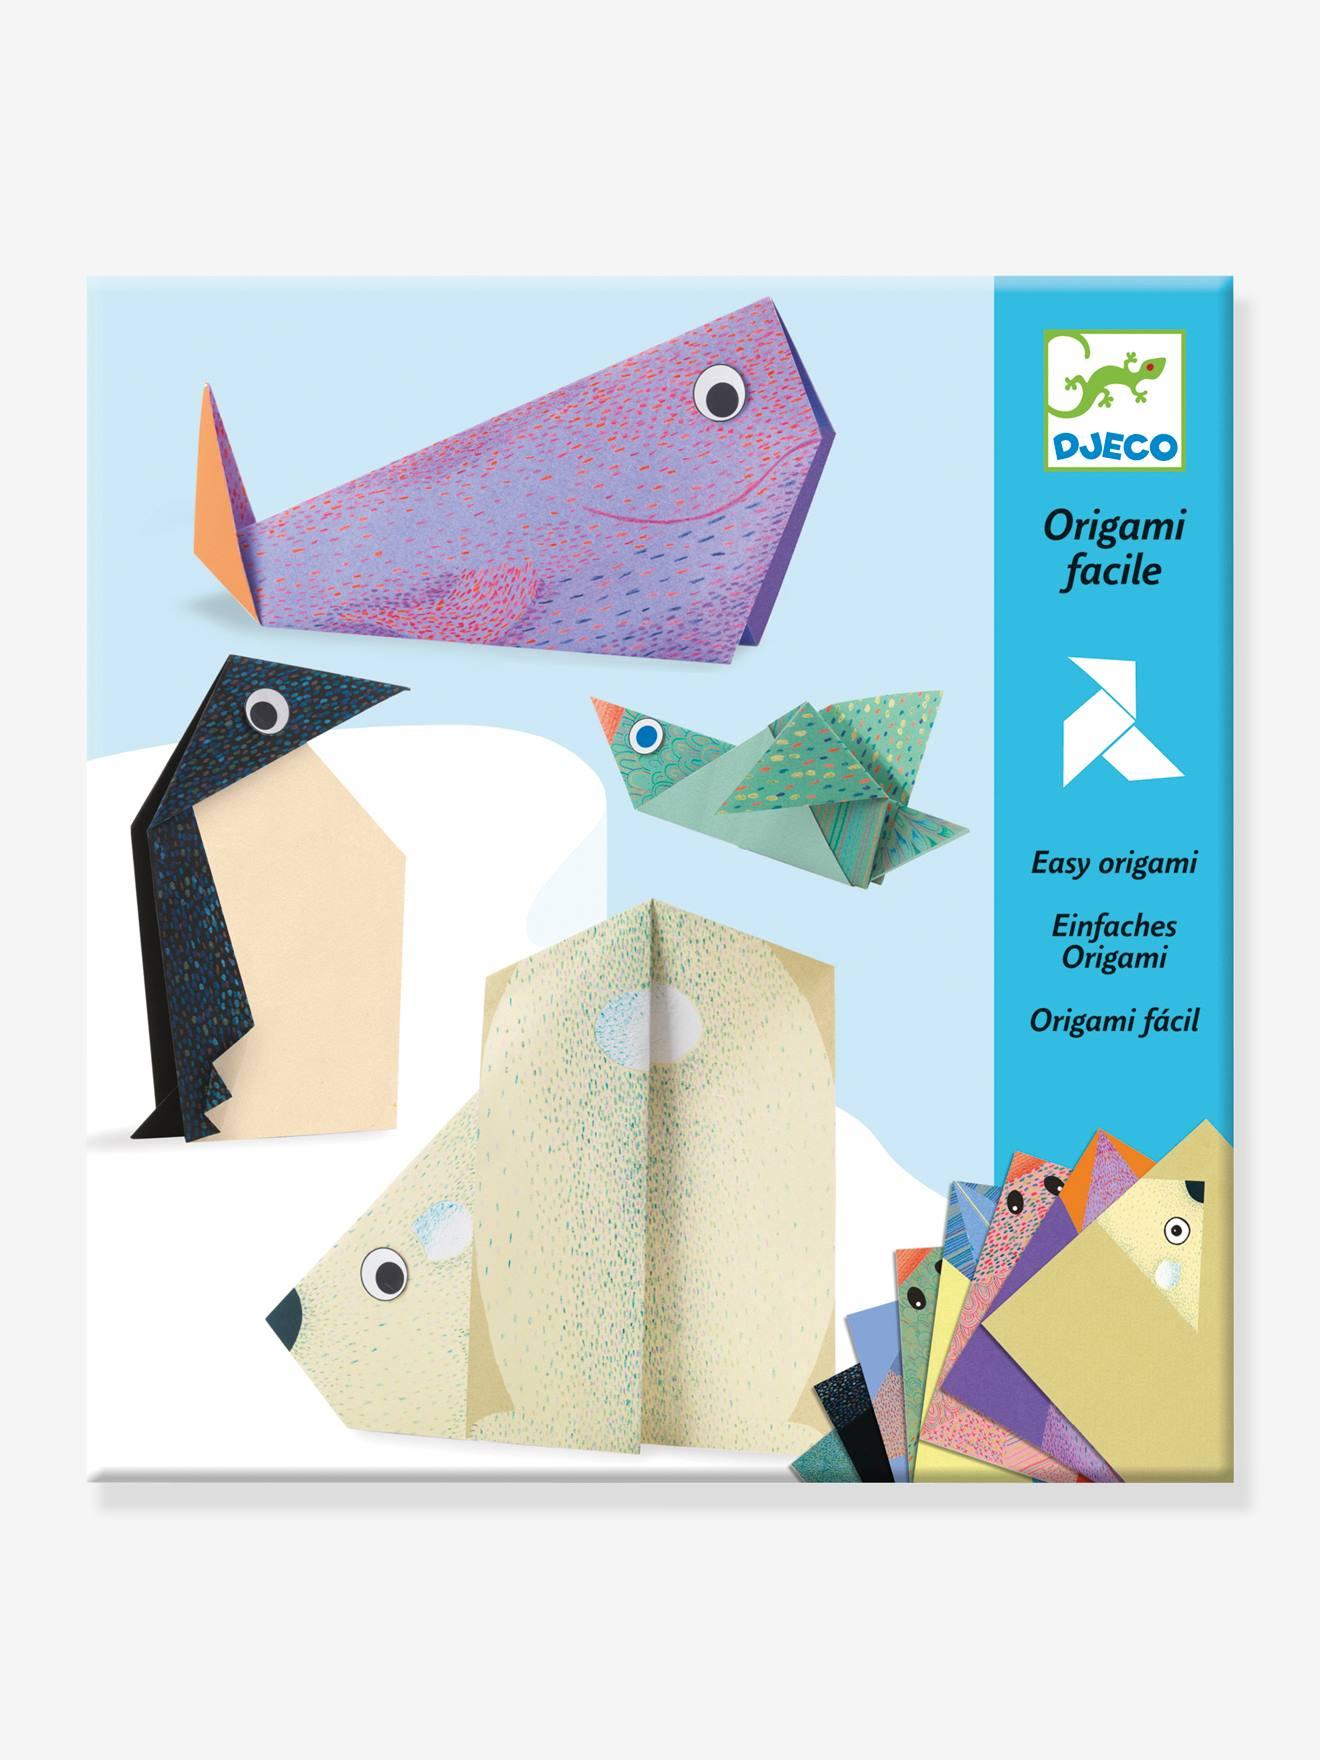 Origami facile - Les animaux polaires DJECO bleu